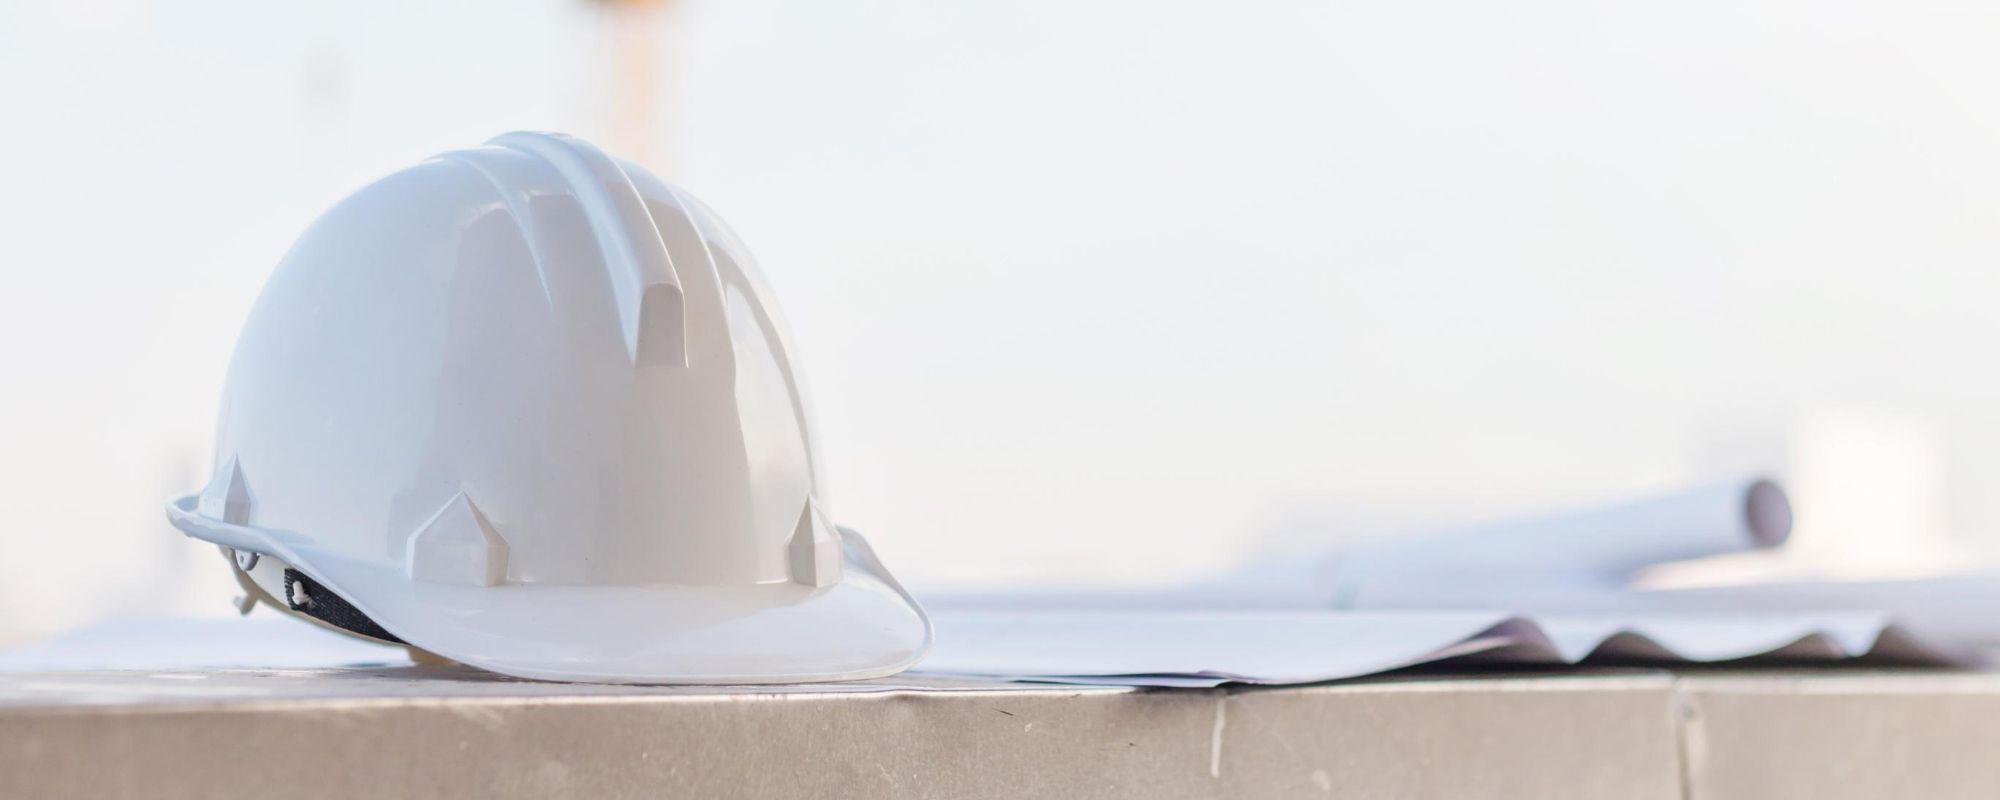 Safety Helmet on Light Background